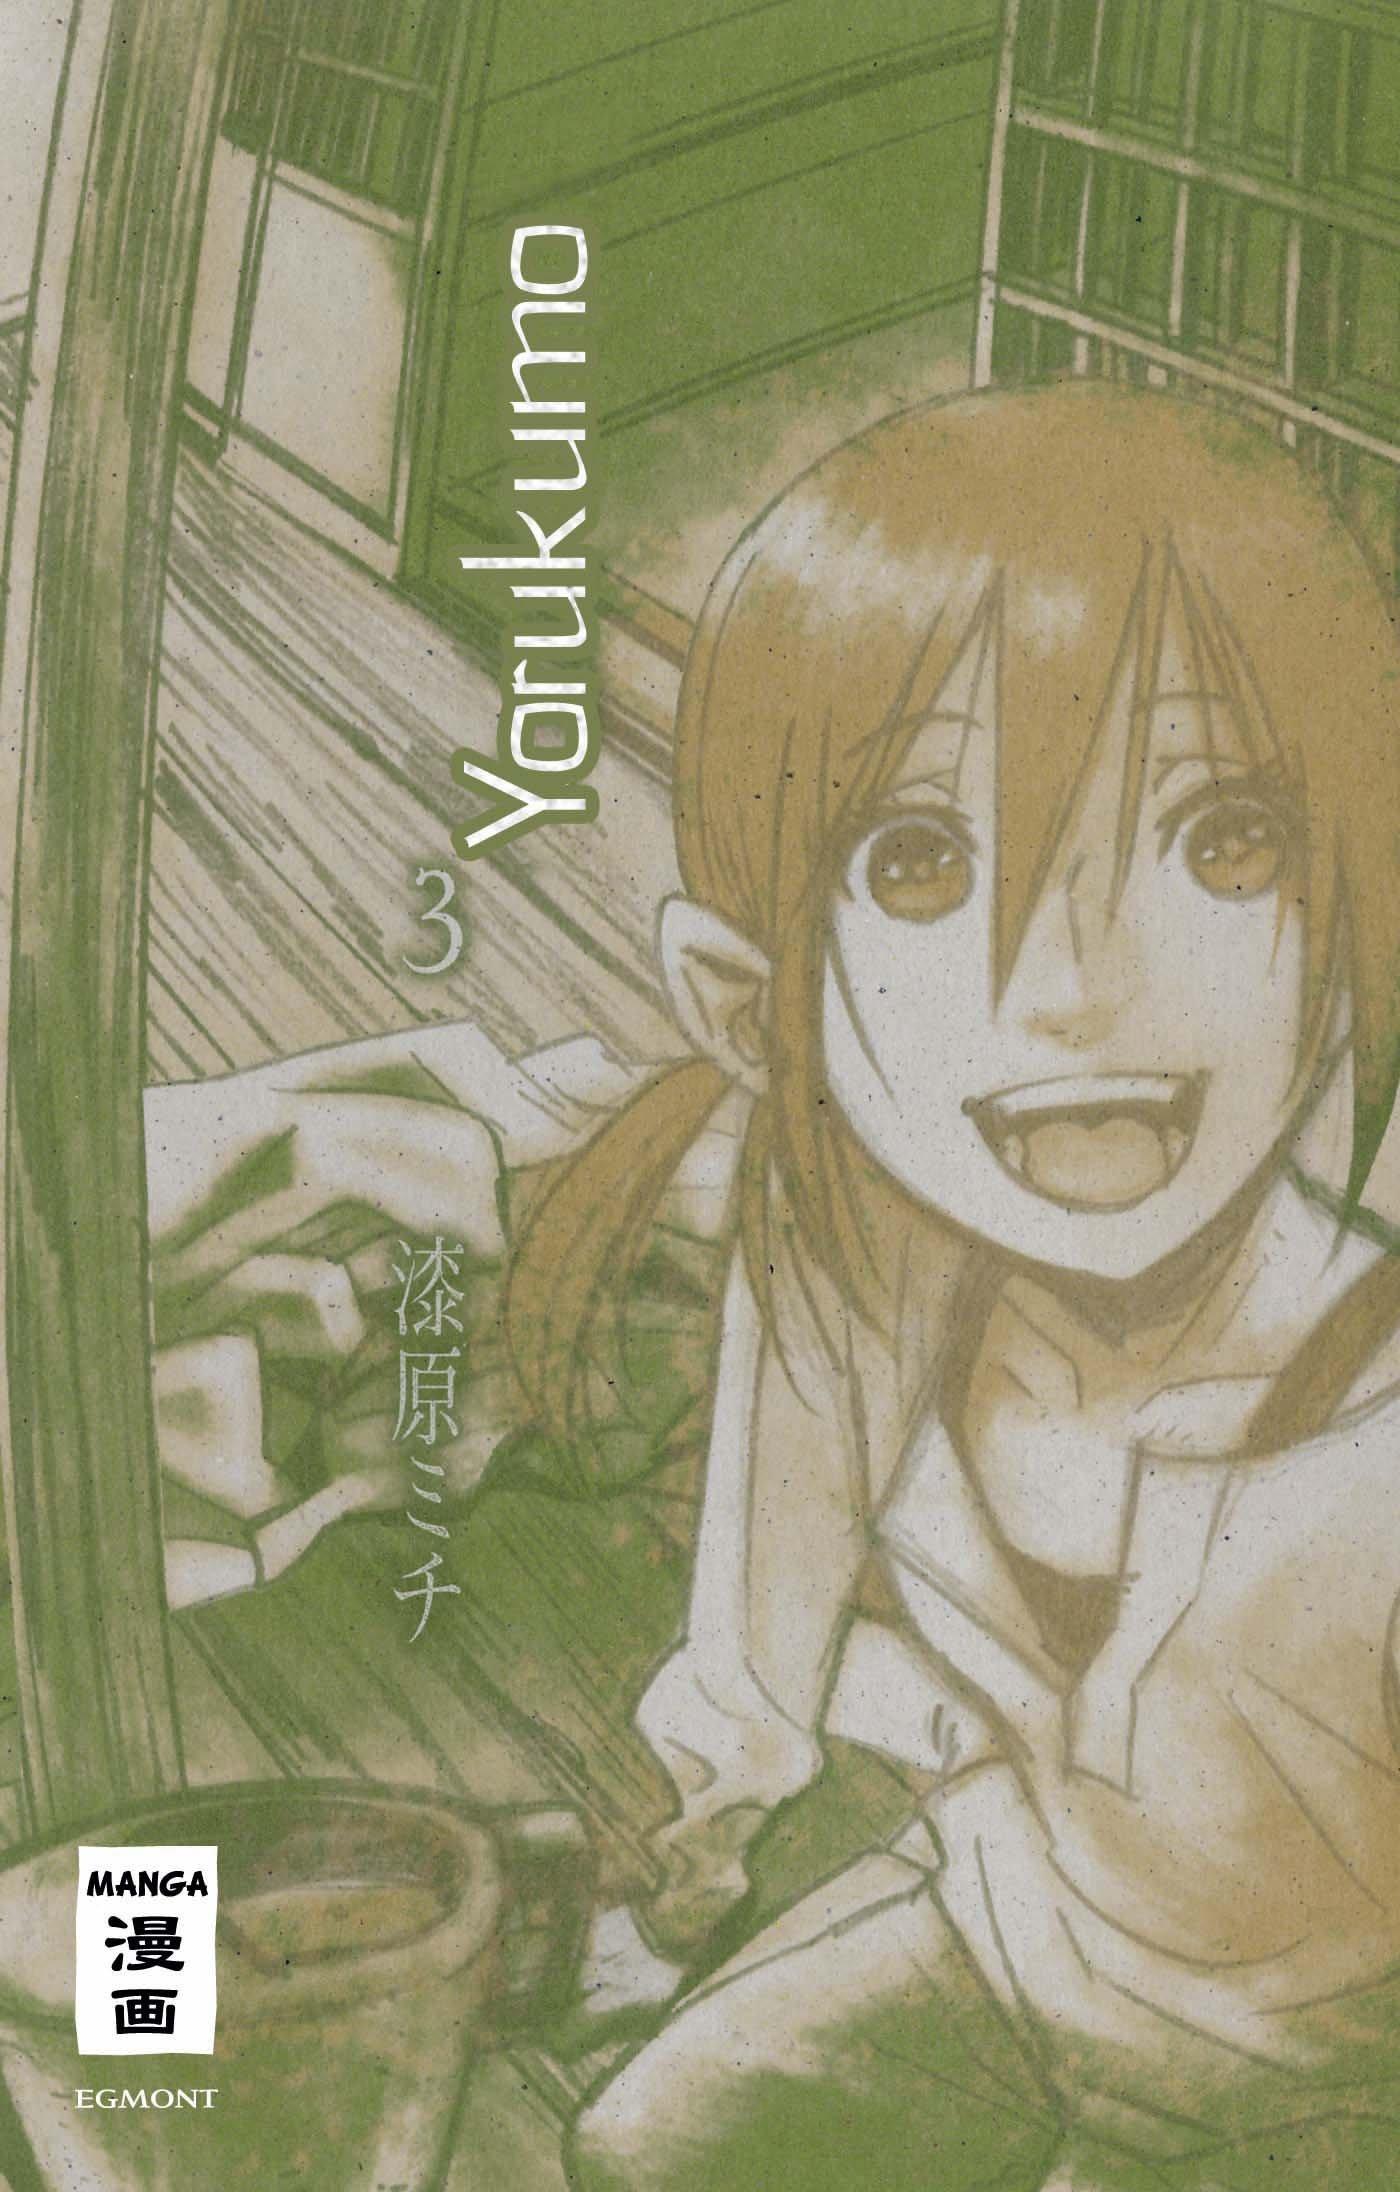 Yorukumo, Band 3